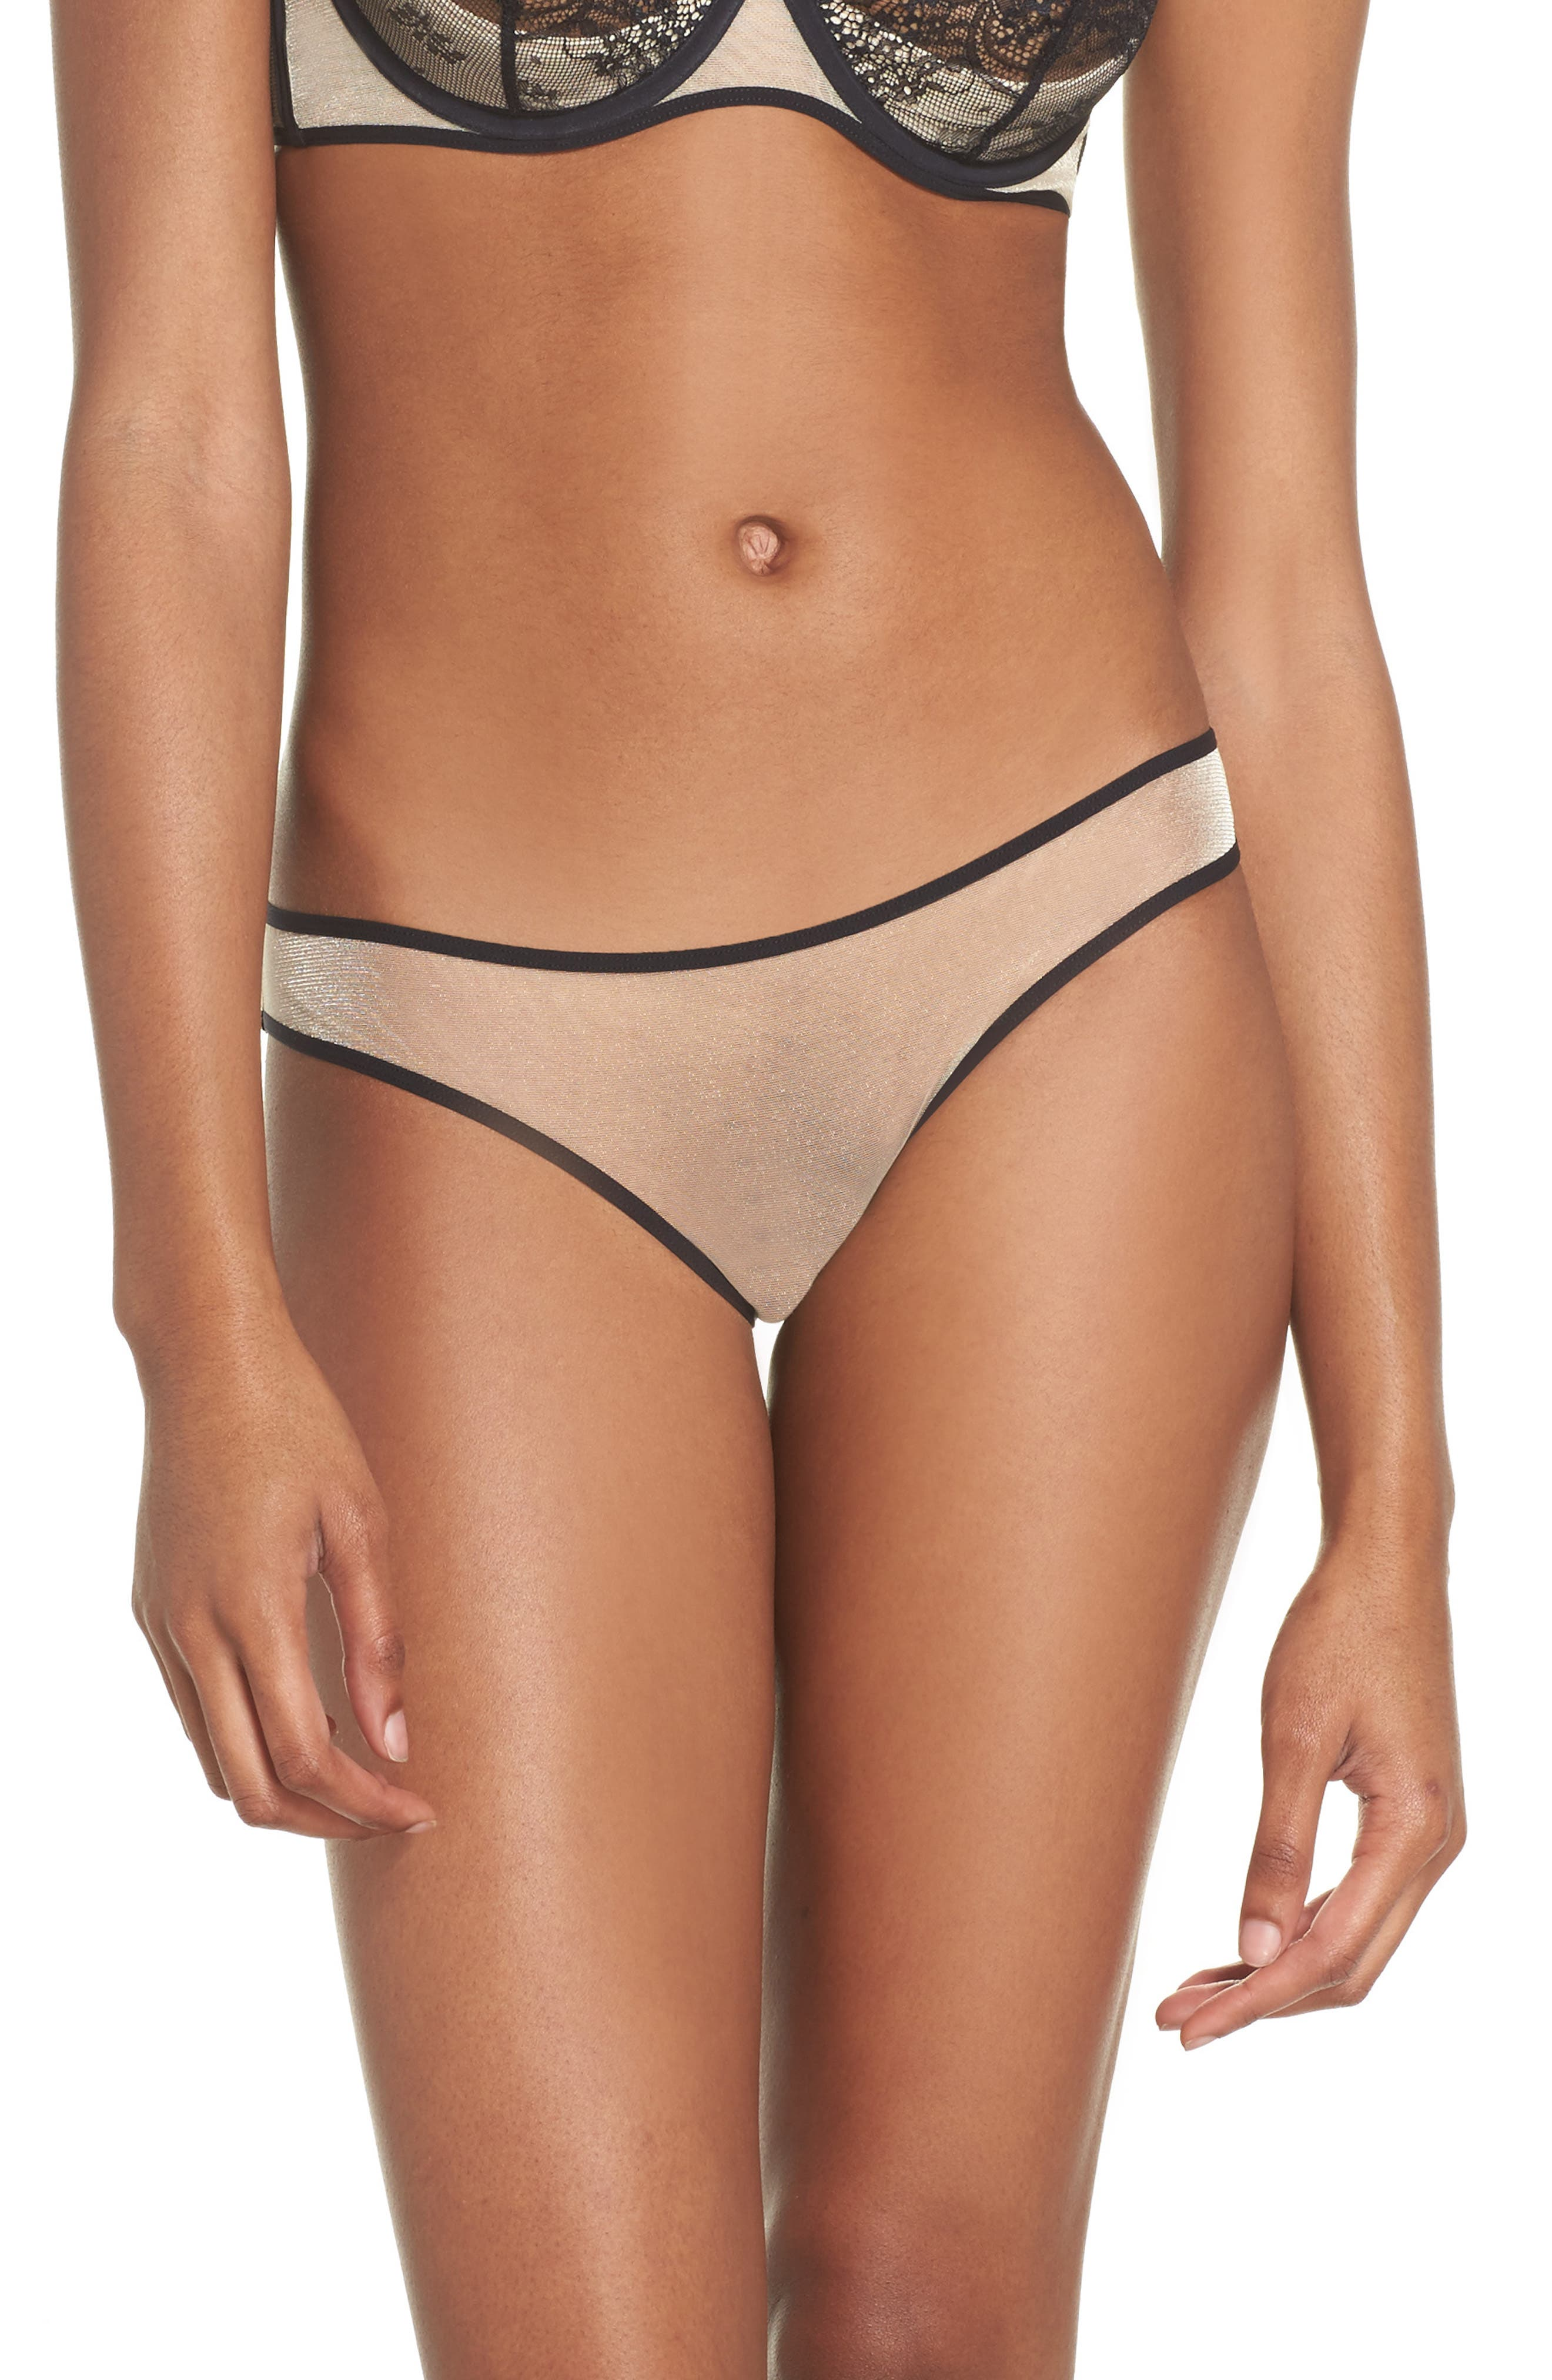 L'Antichambre Sheer Panties,                         Main,                         color, Black / Nude